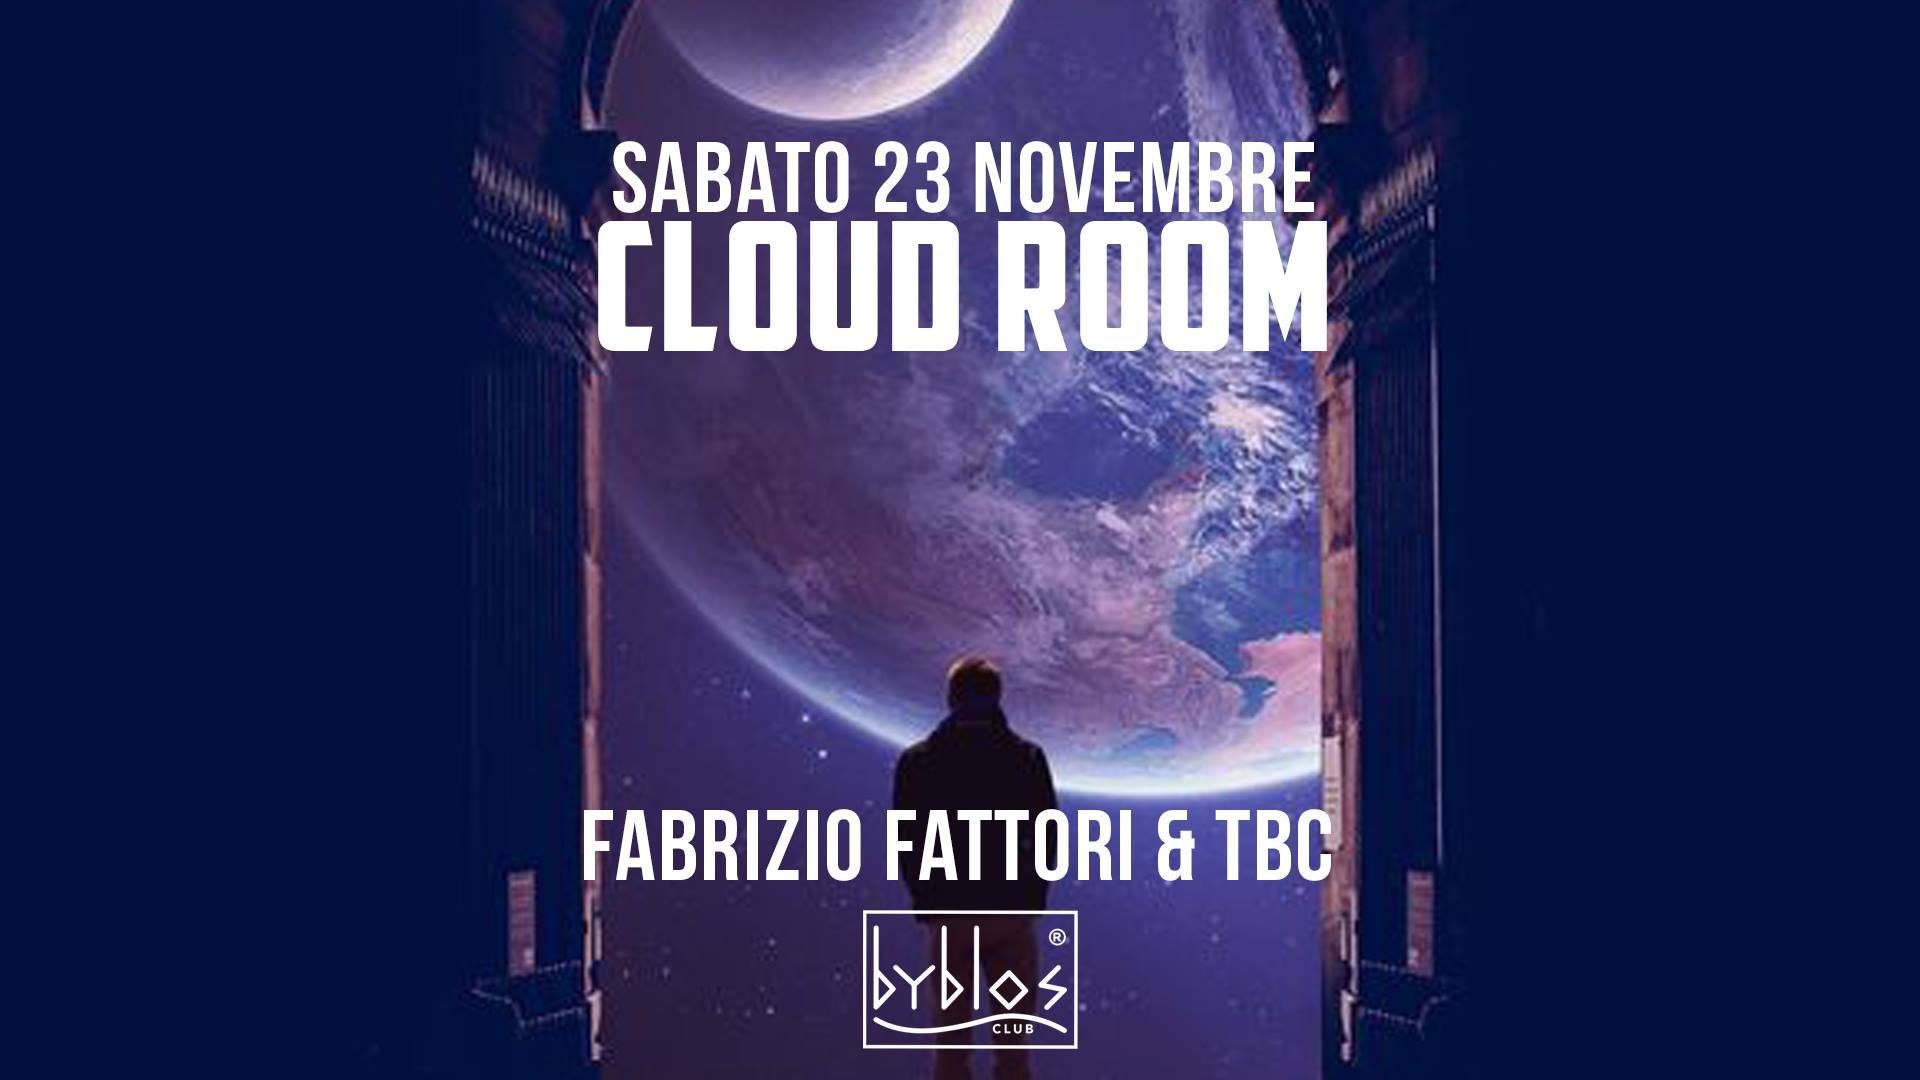 Cloud Room Byblos Misano